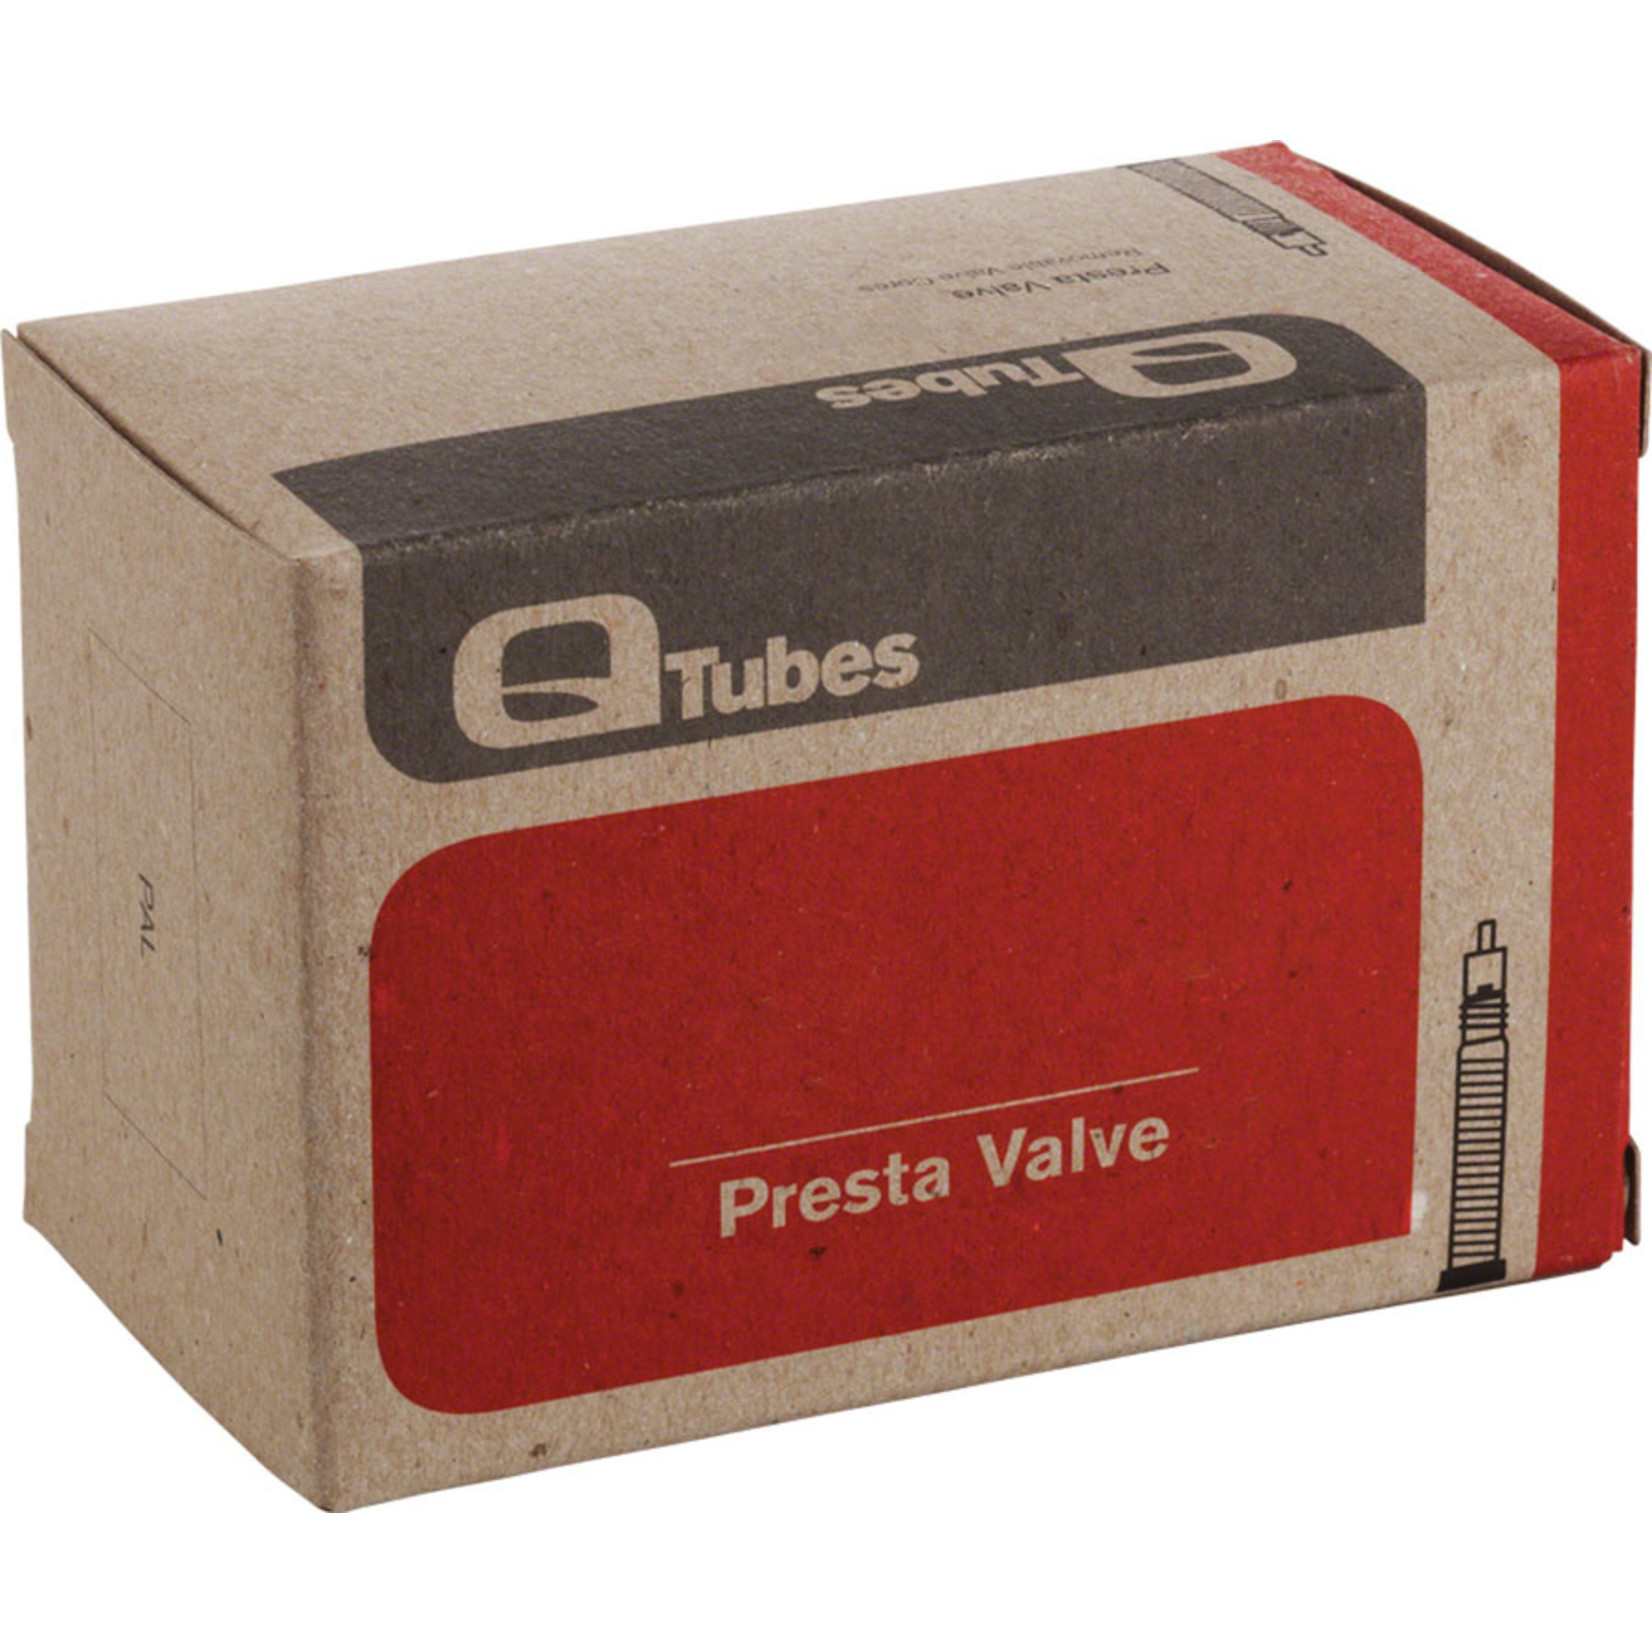 Q-Tubes Q-Tubes Superlight 650c x 18-23mm 60mm Presta Valve Tube